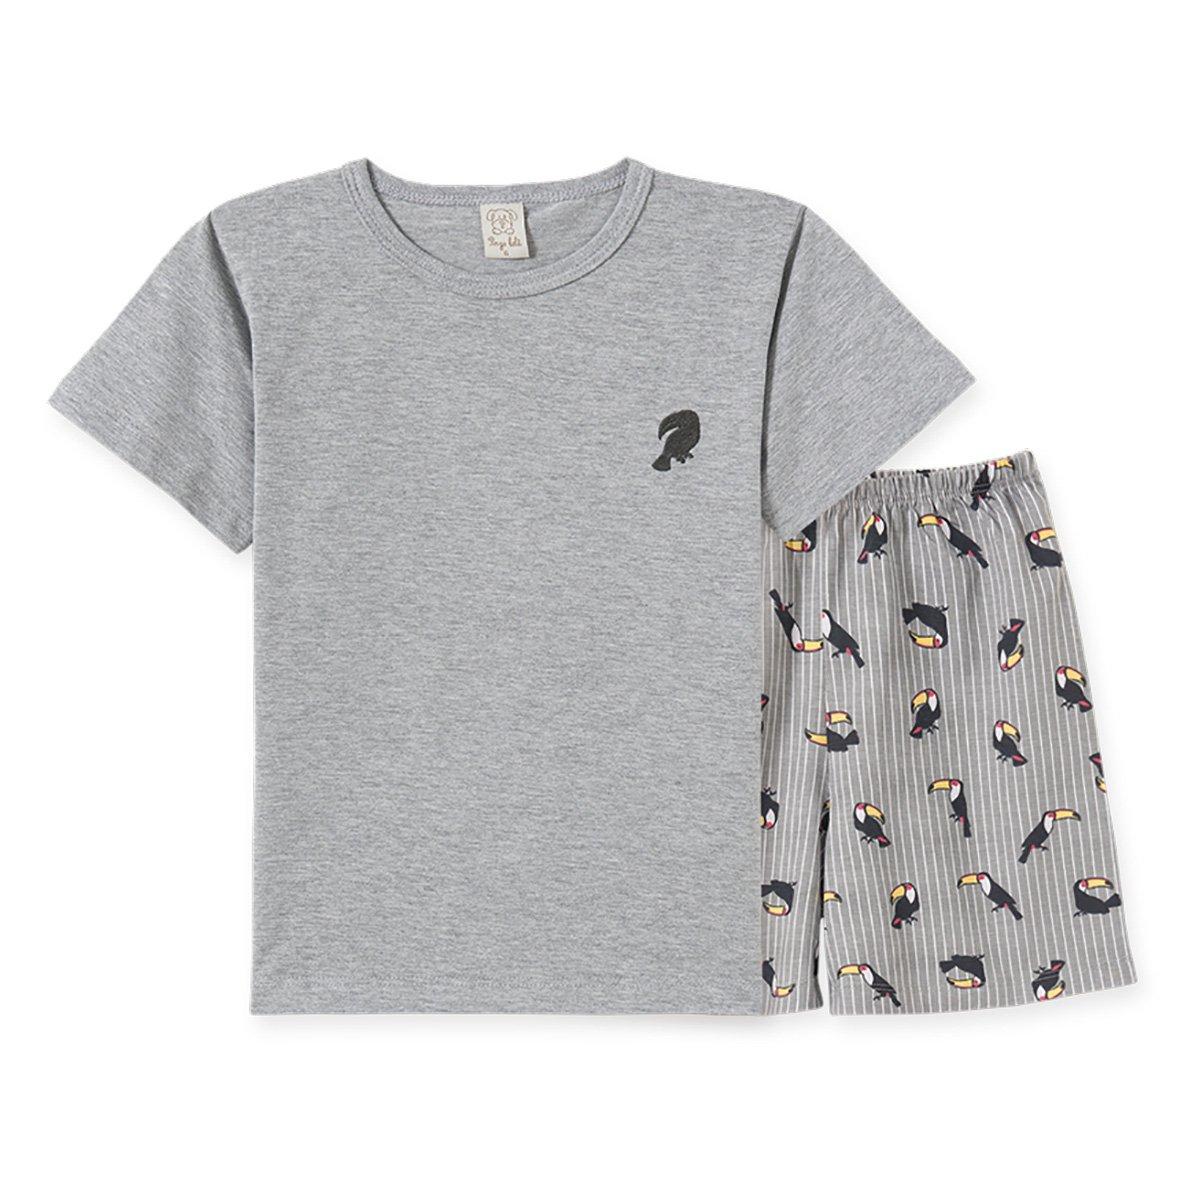 Pijama Juvenil Pingo Lelê Camiseta Tucano + Bermuda Masculino